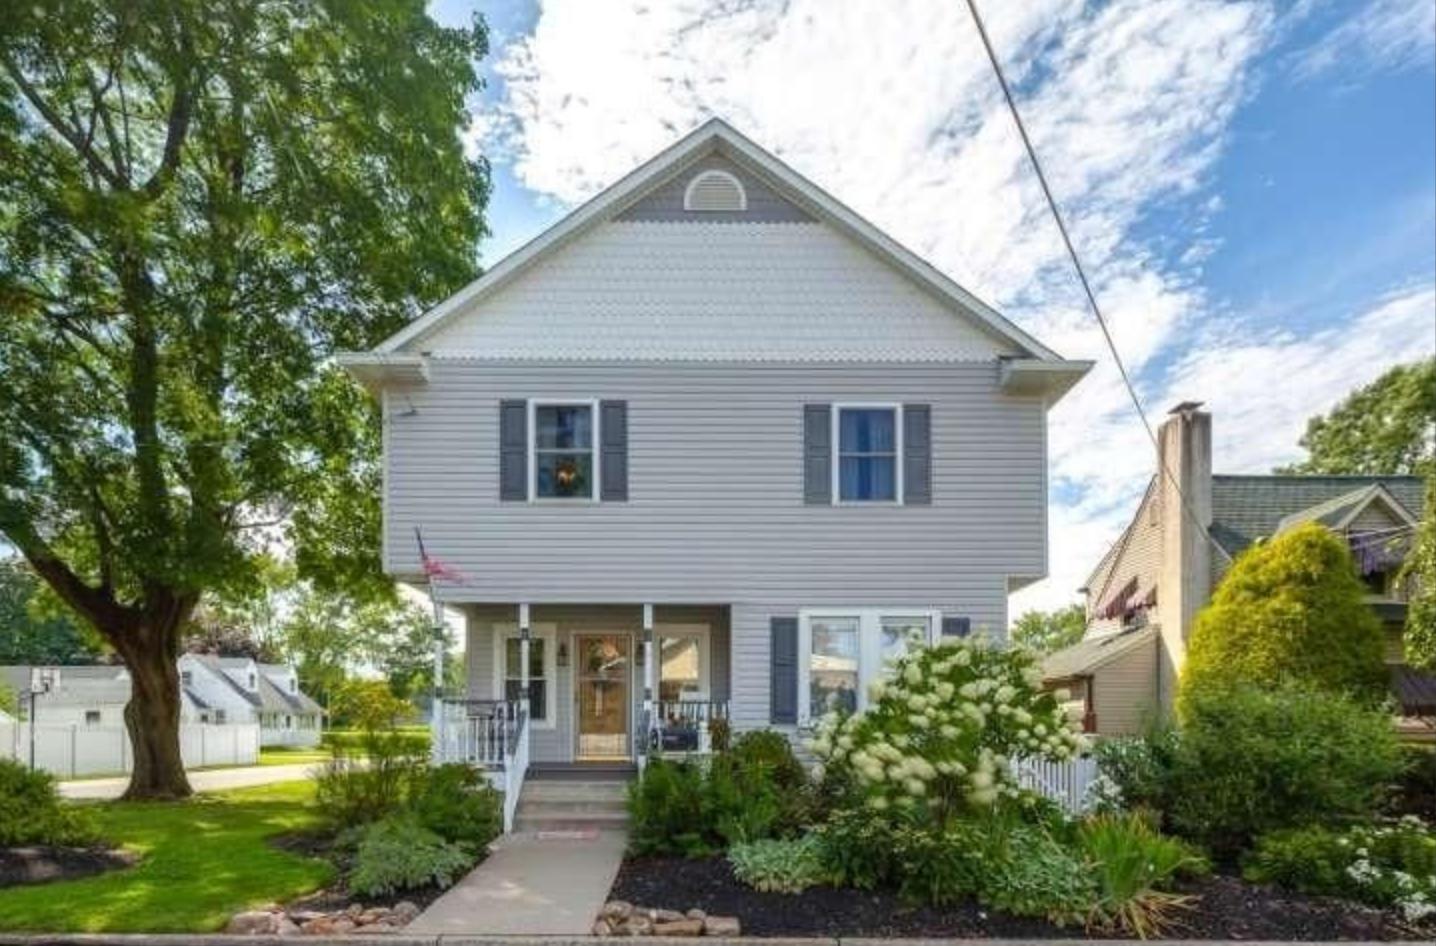 Bristol, Pennsylvania (Philadelphia-Camden-Wilmington, PA-NJ-DE-MD); list price: $299,000; square footage: 2,814; beds/baths: 4/3